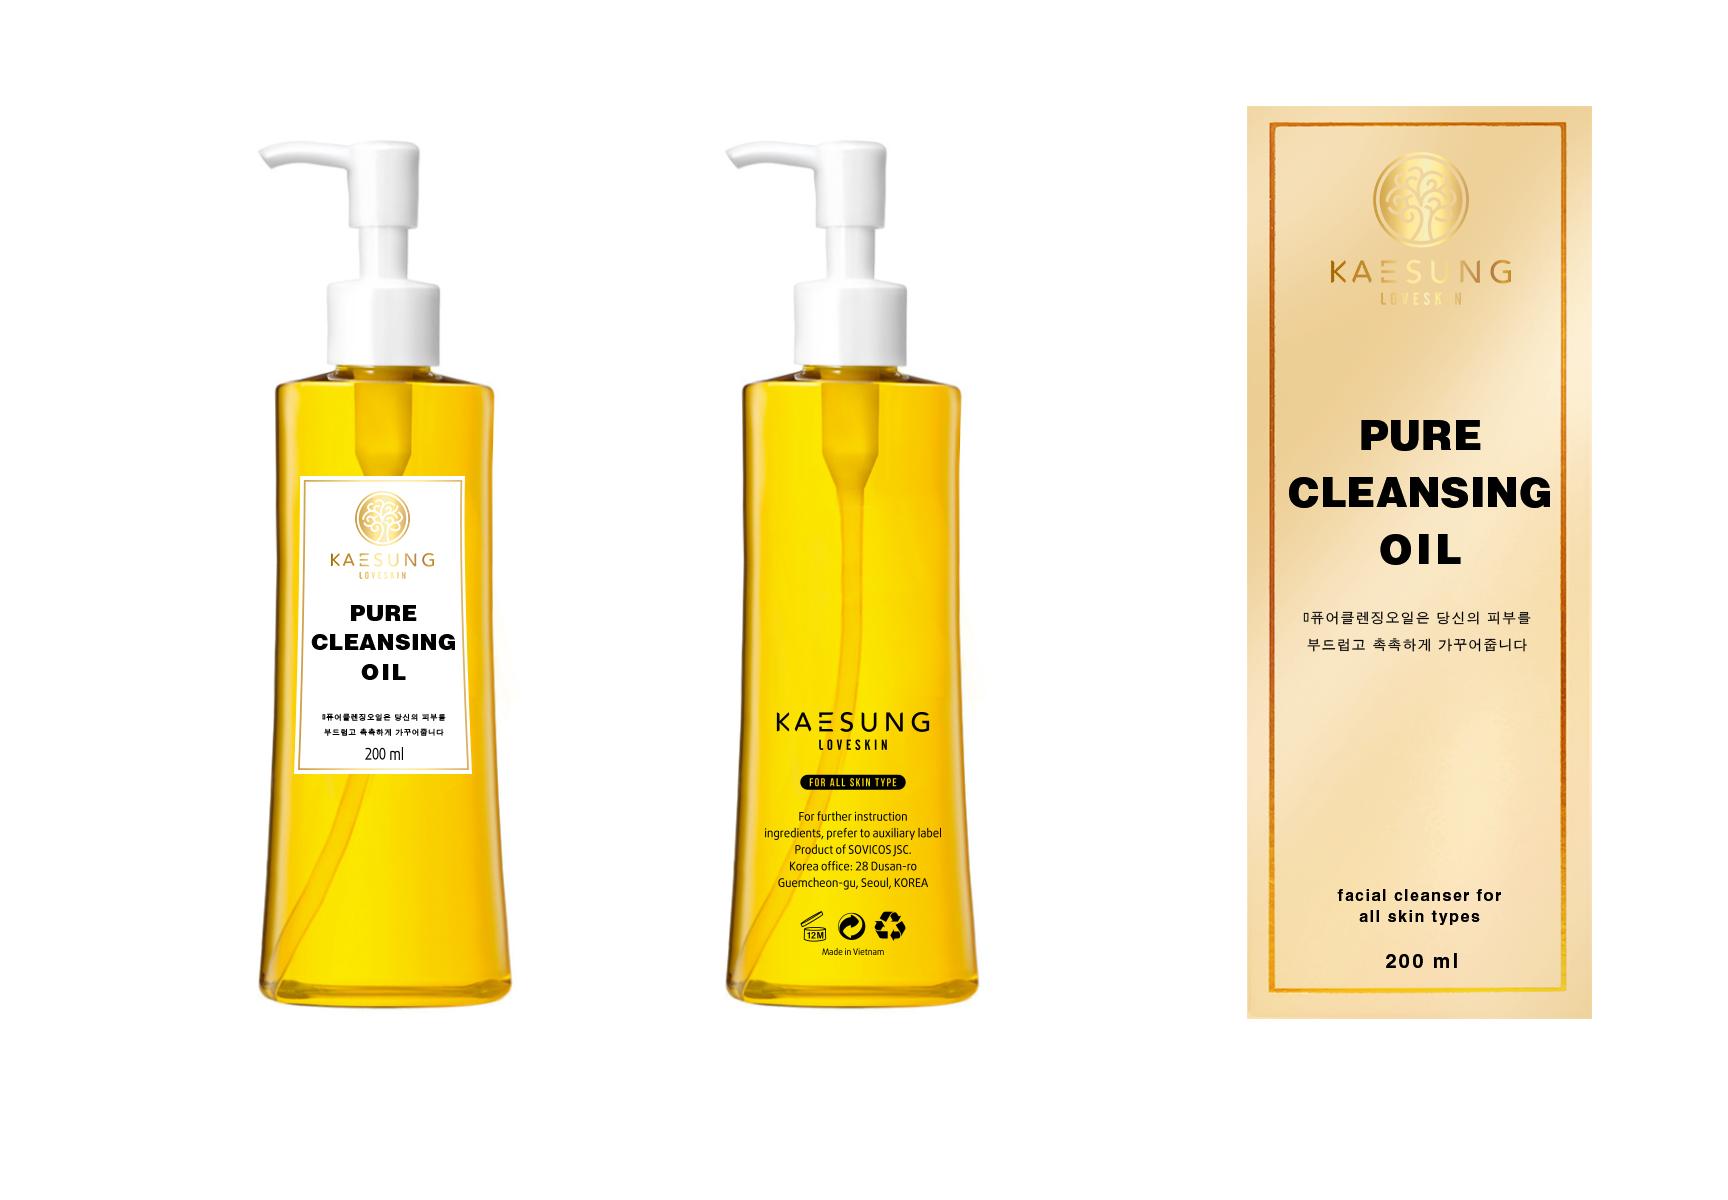 Dầu tẩy trang Kaesung Loveskin - Pure cleansing oil